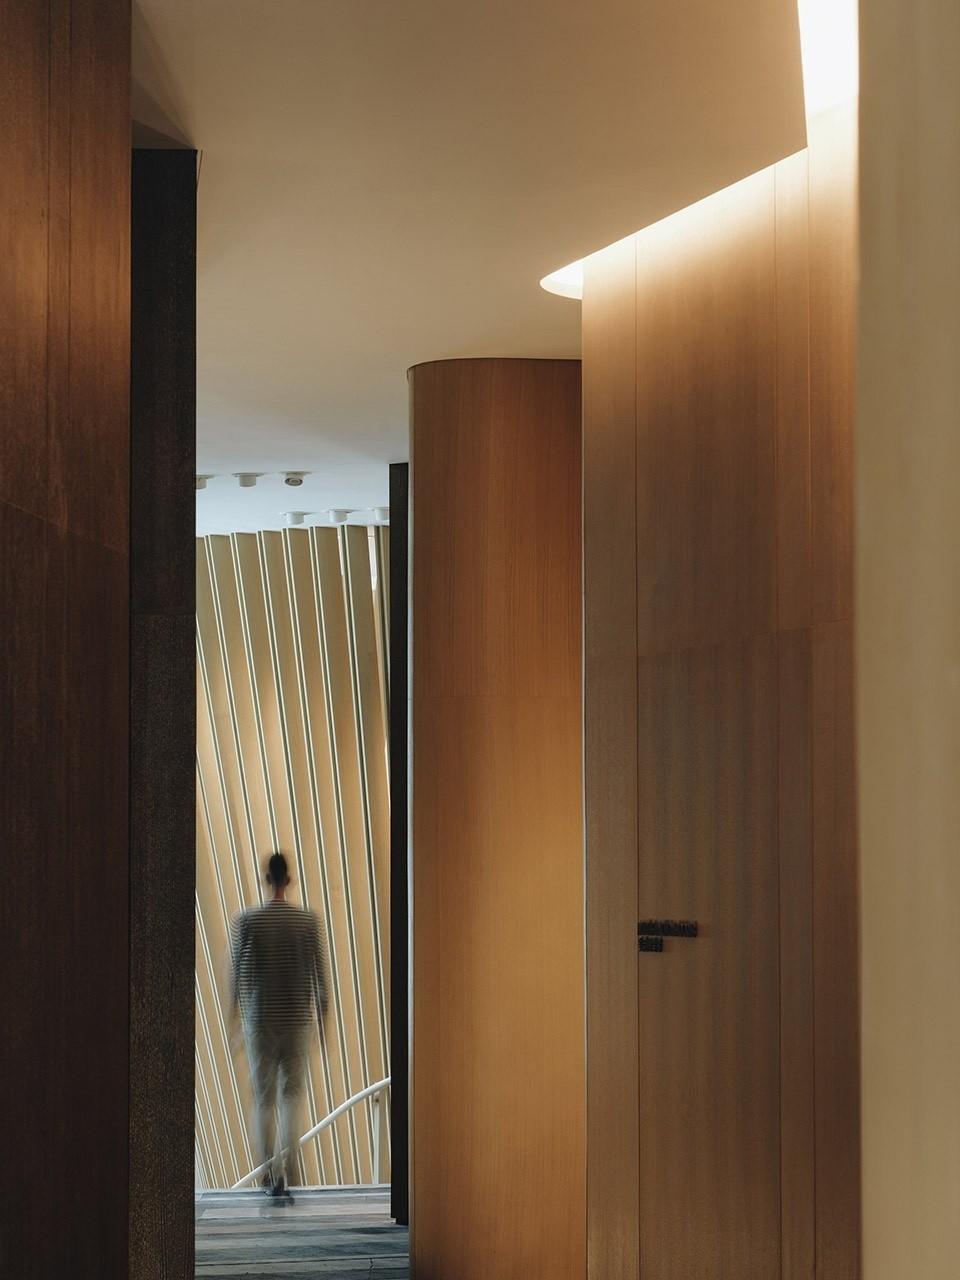 008-tseung-kwan-o-alto-residences-clubhouse-china-by-one-plus-partnership-960x1280.jpg